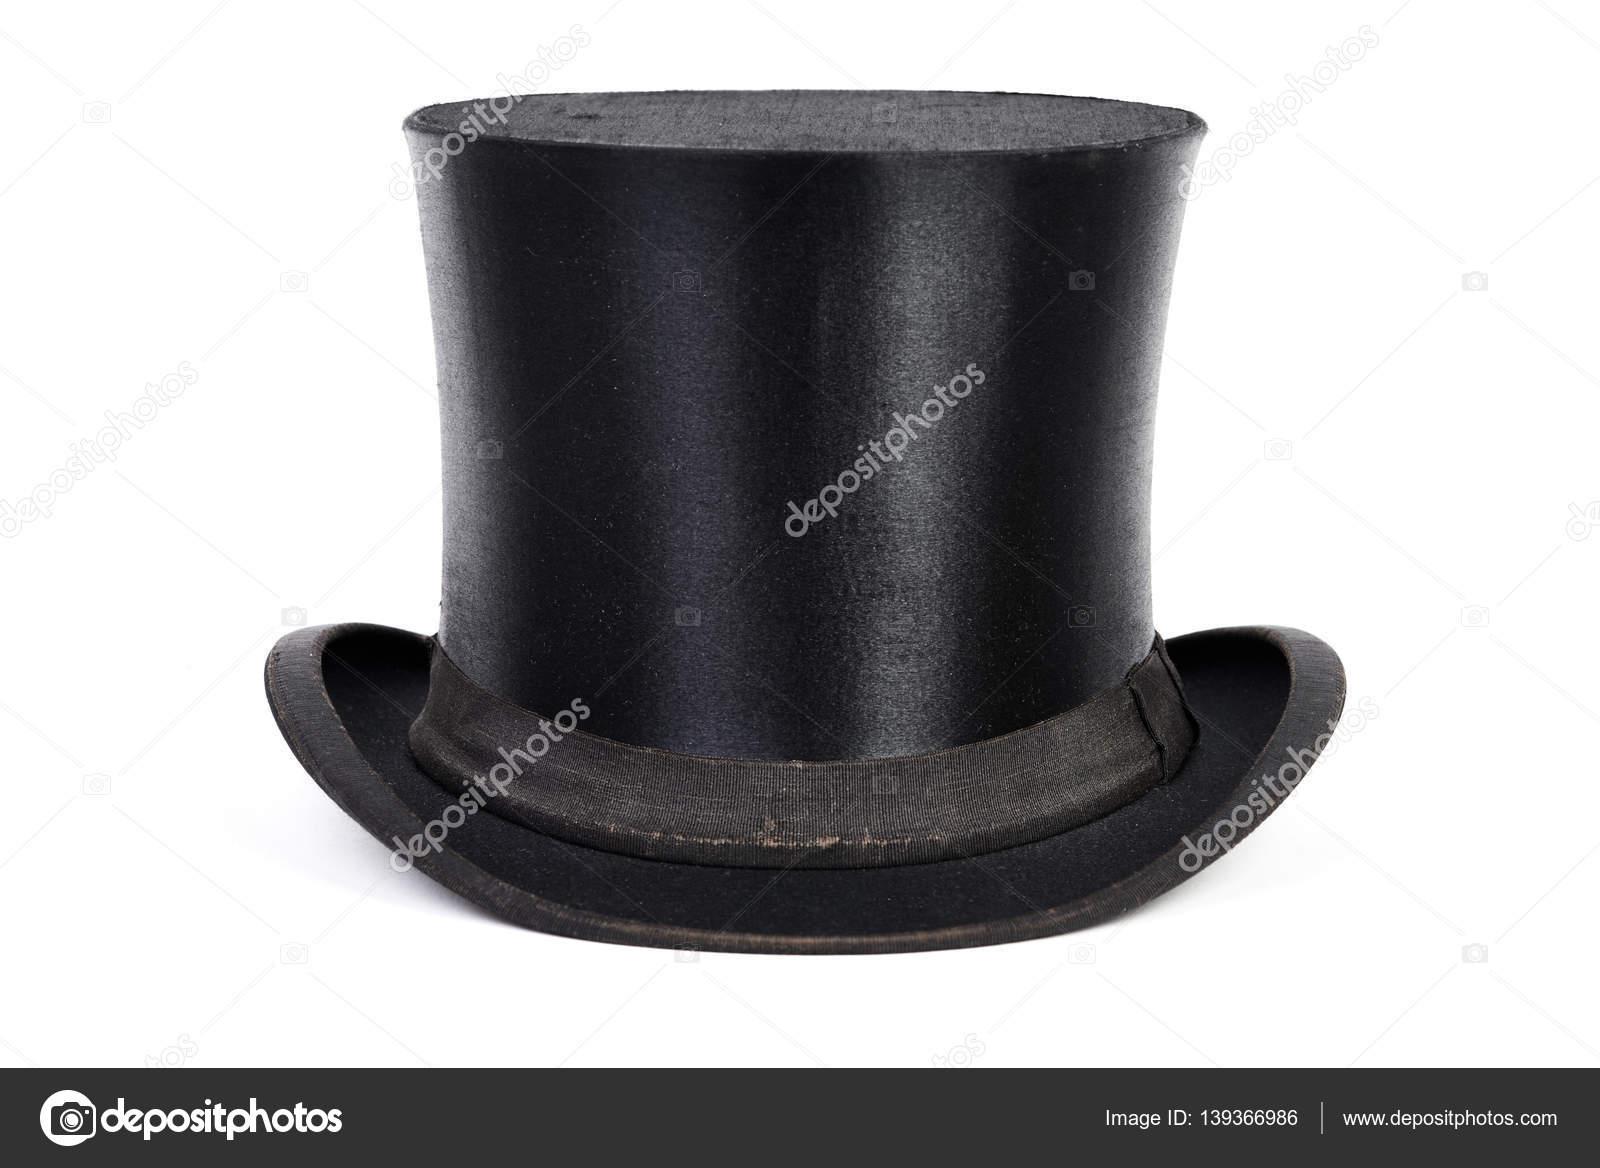 fekete cilindert 19ed4c087b